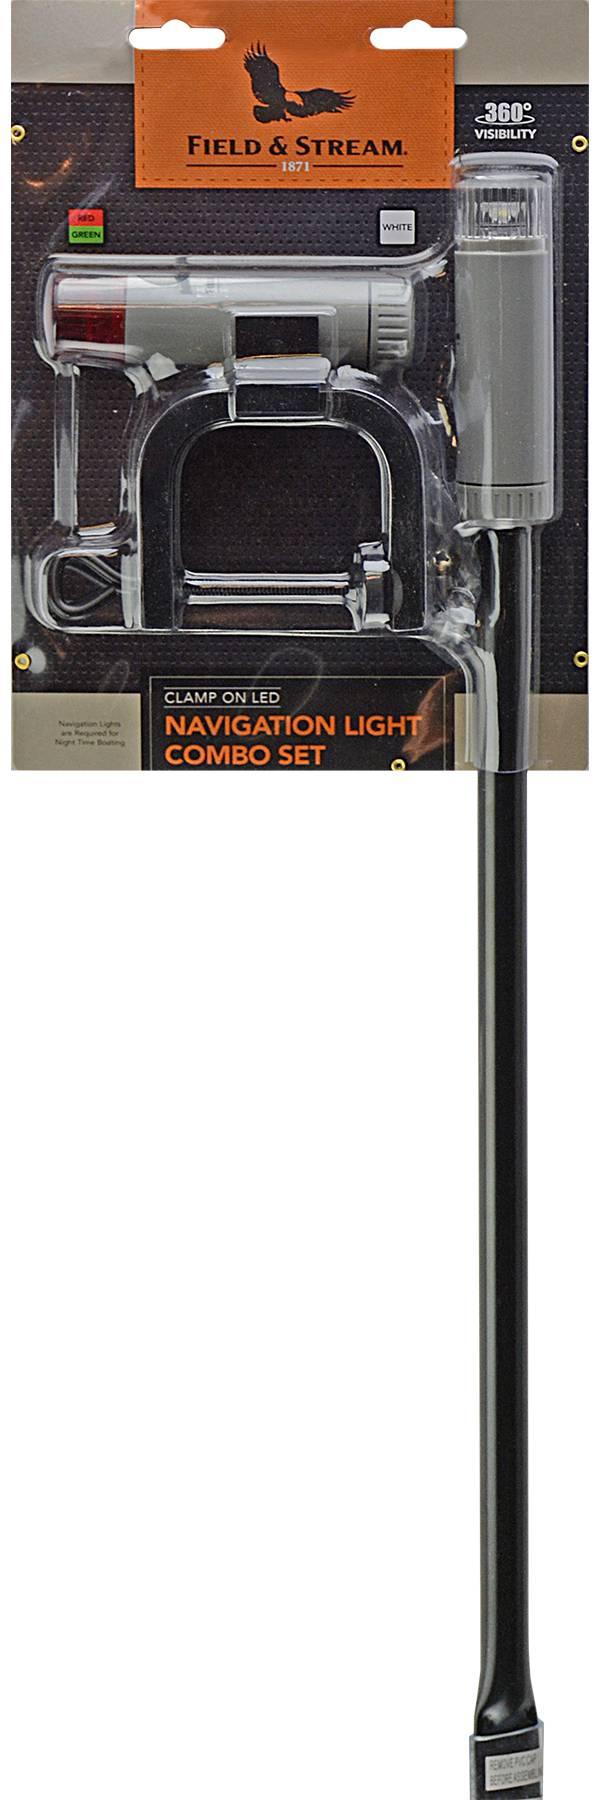 Field & Stream Navigation Light Combo Set product image